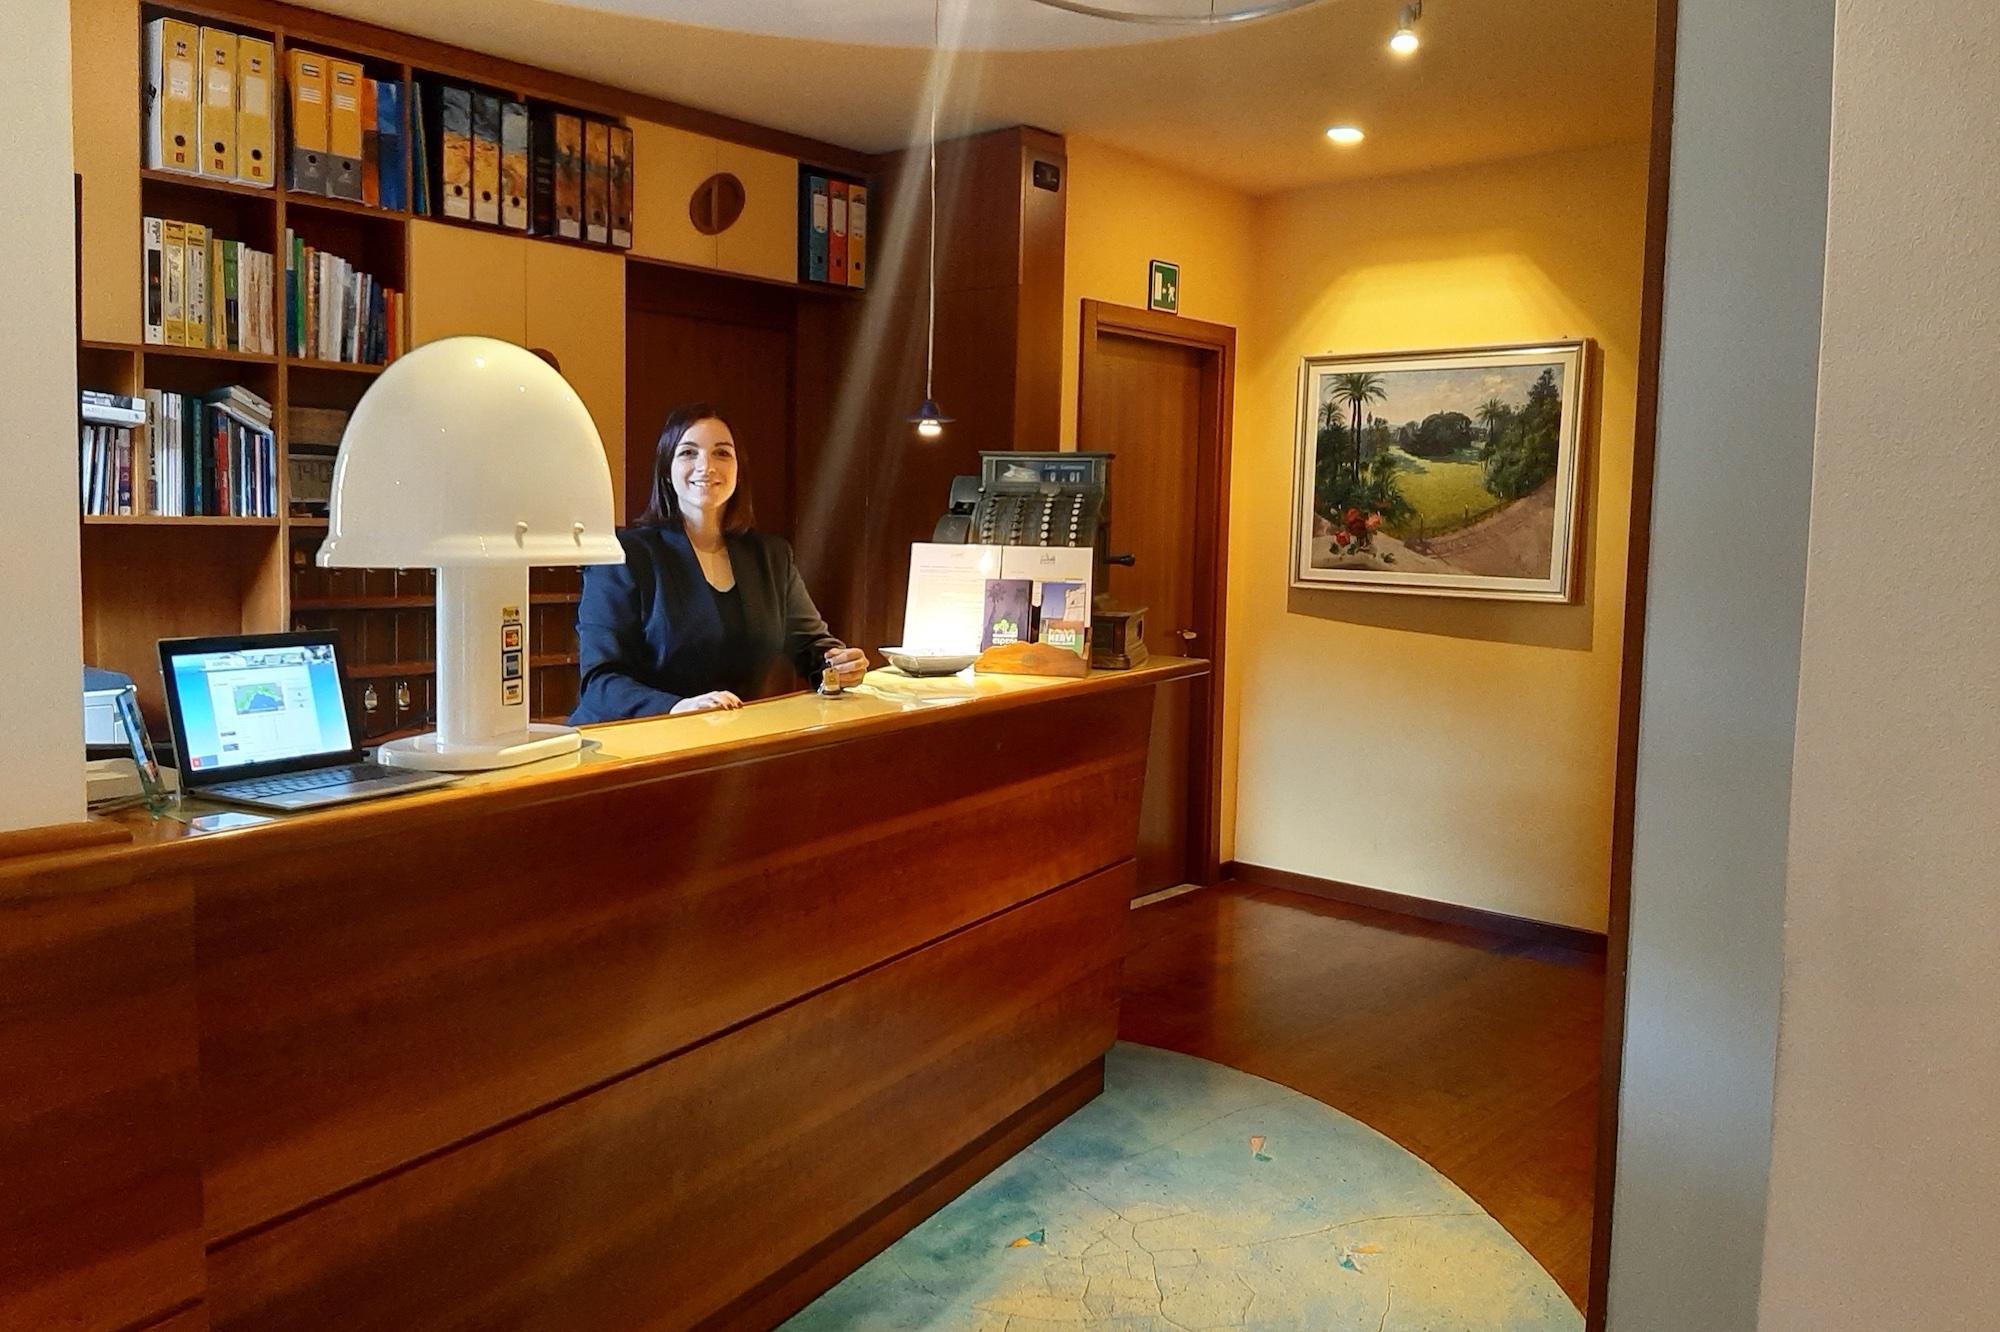 hotel esperia genova nervi reception servizi cut